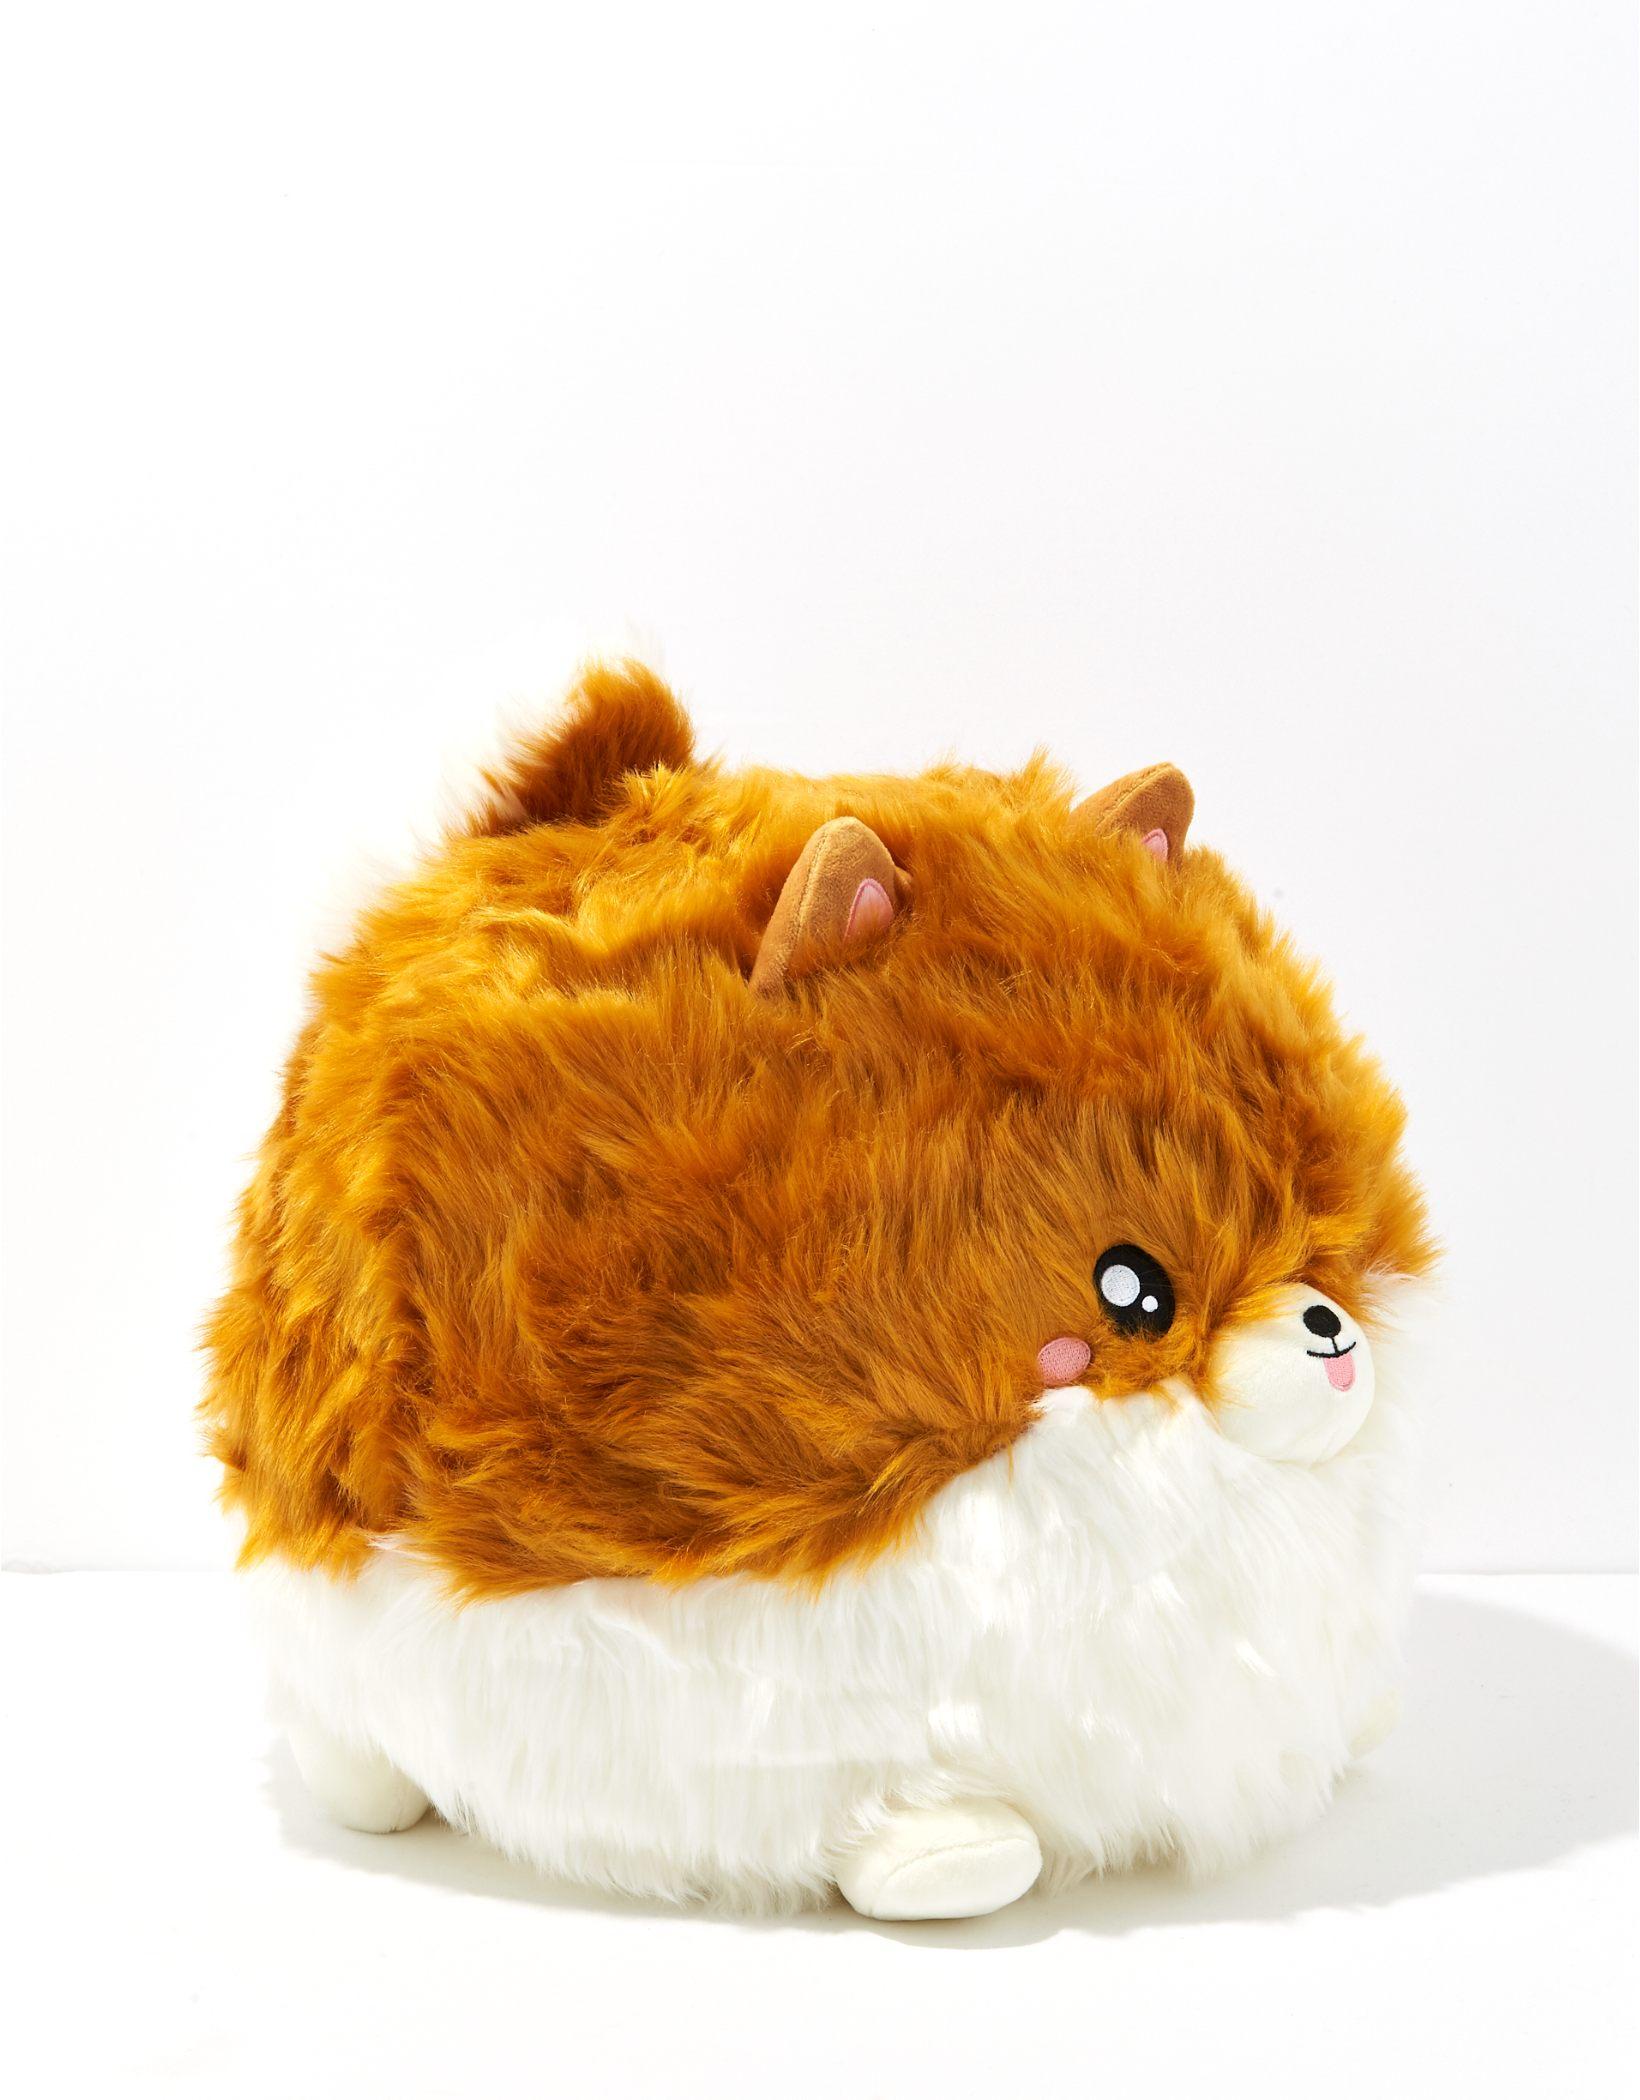 Squishable Pomeranian Plush